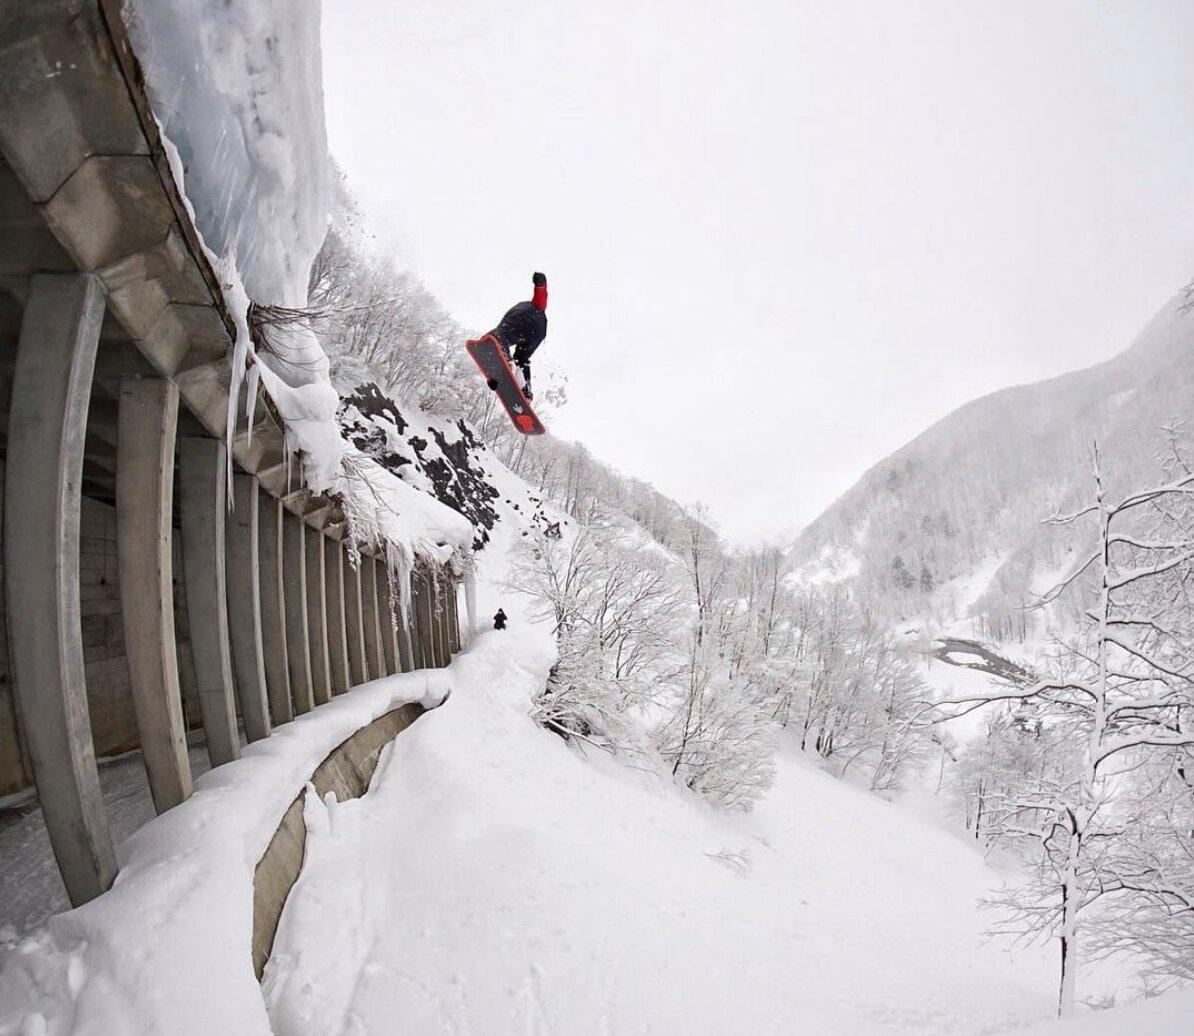 max-snowboarder-1552074533407.jpg